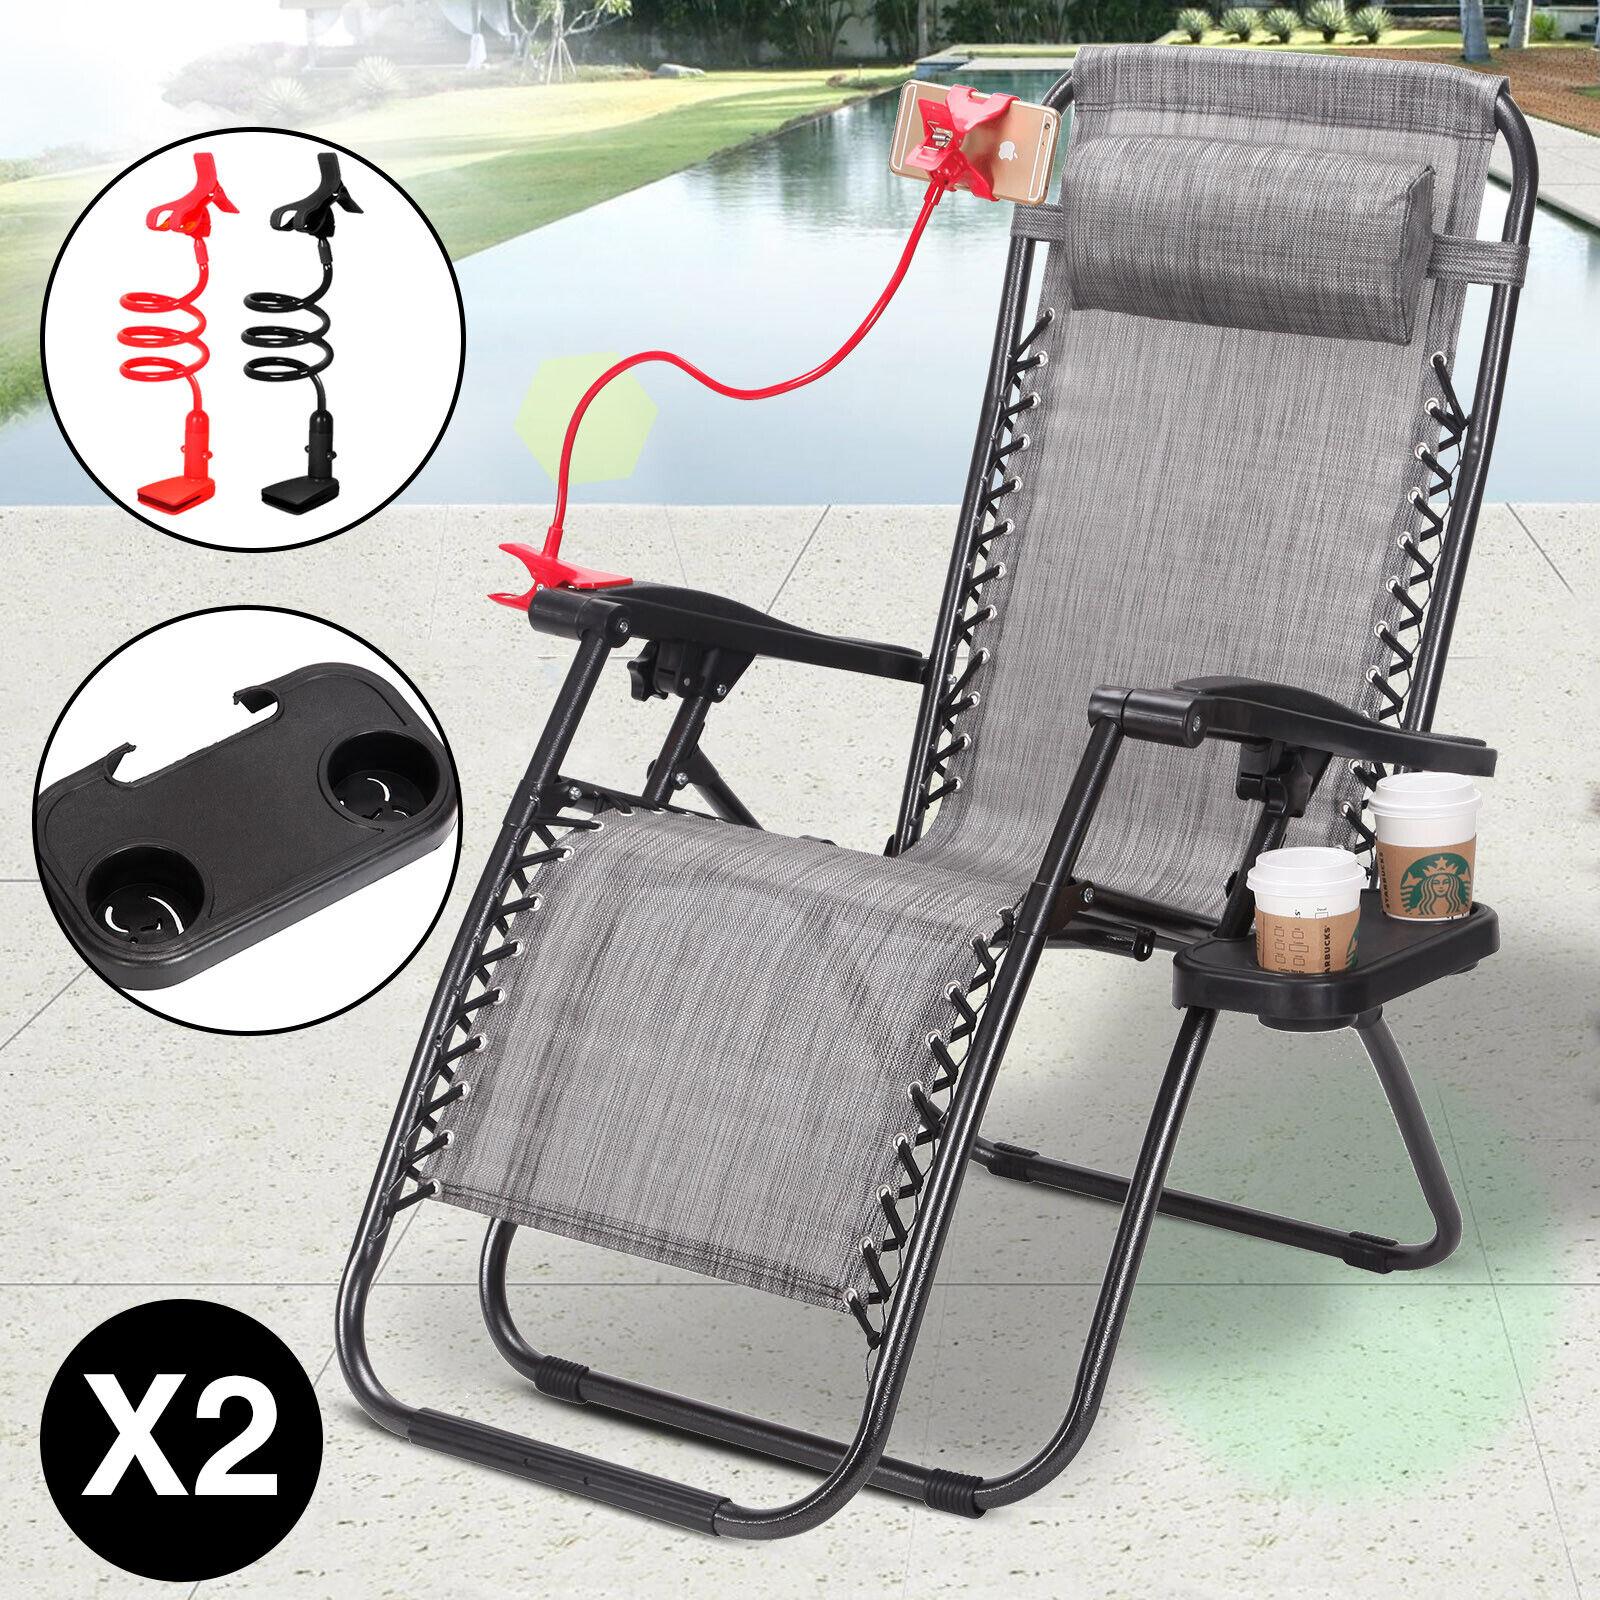 2 Zero Gravity Chairs Folding Patio Lounge Recliner Deck Bea